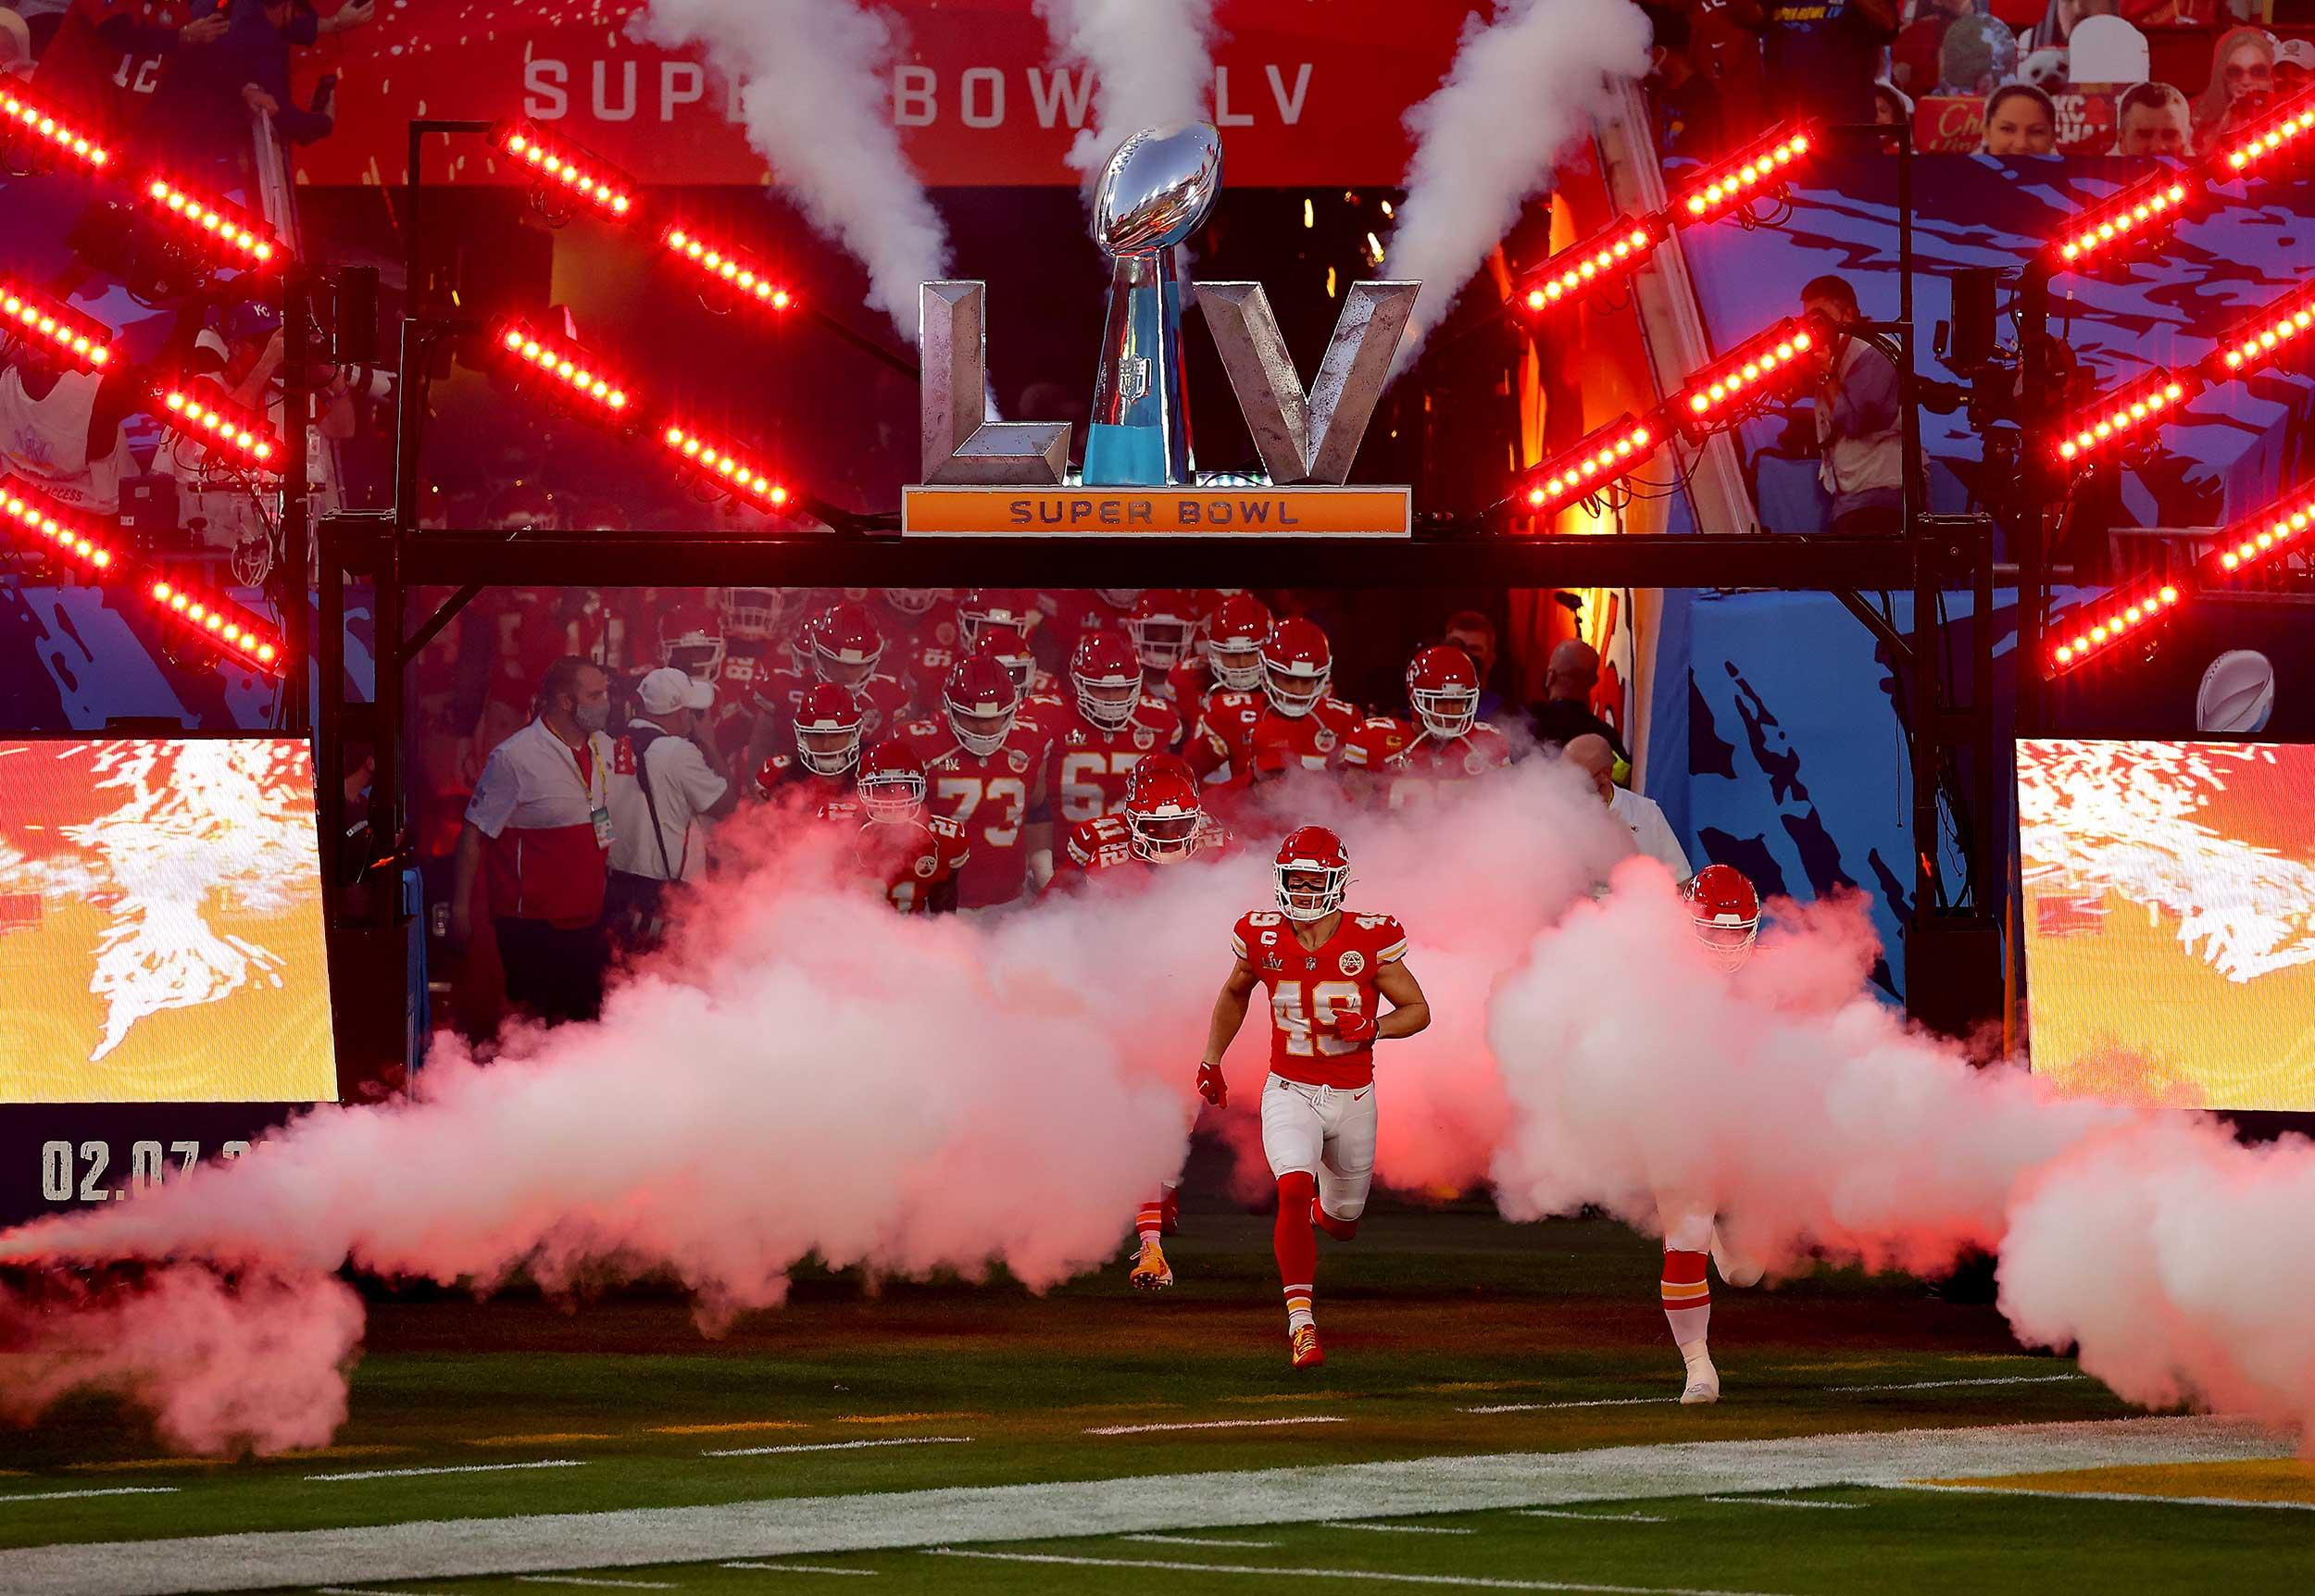 Super Bowl LV - Player Entrance